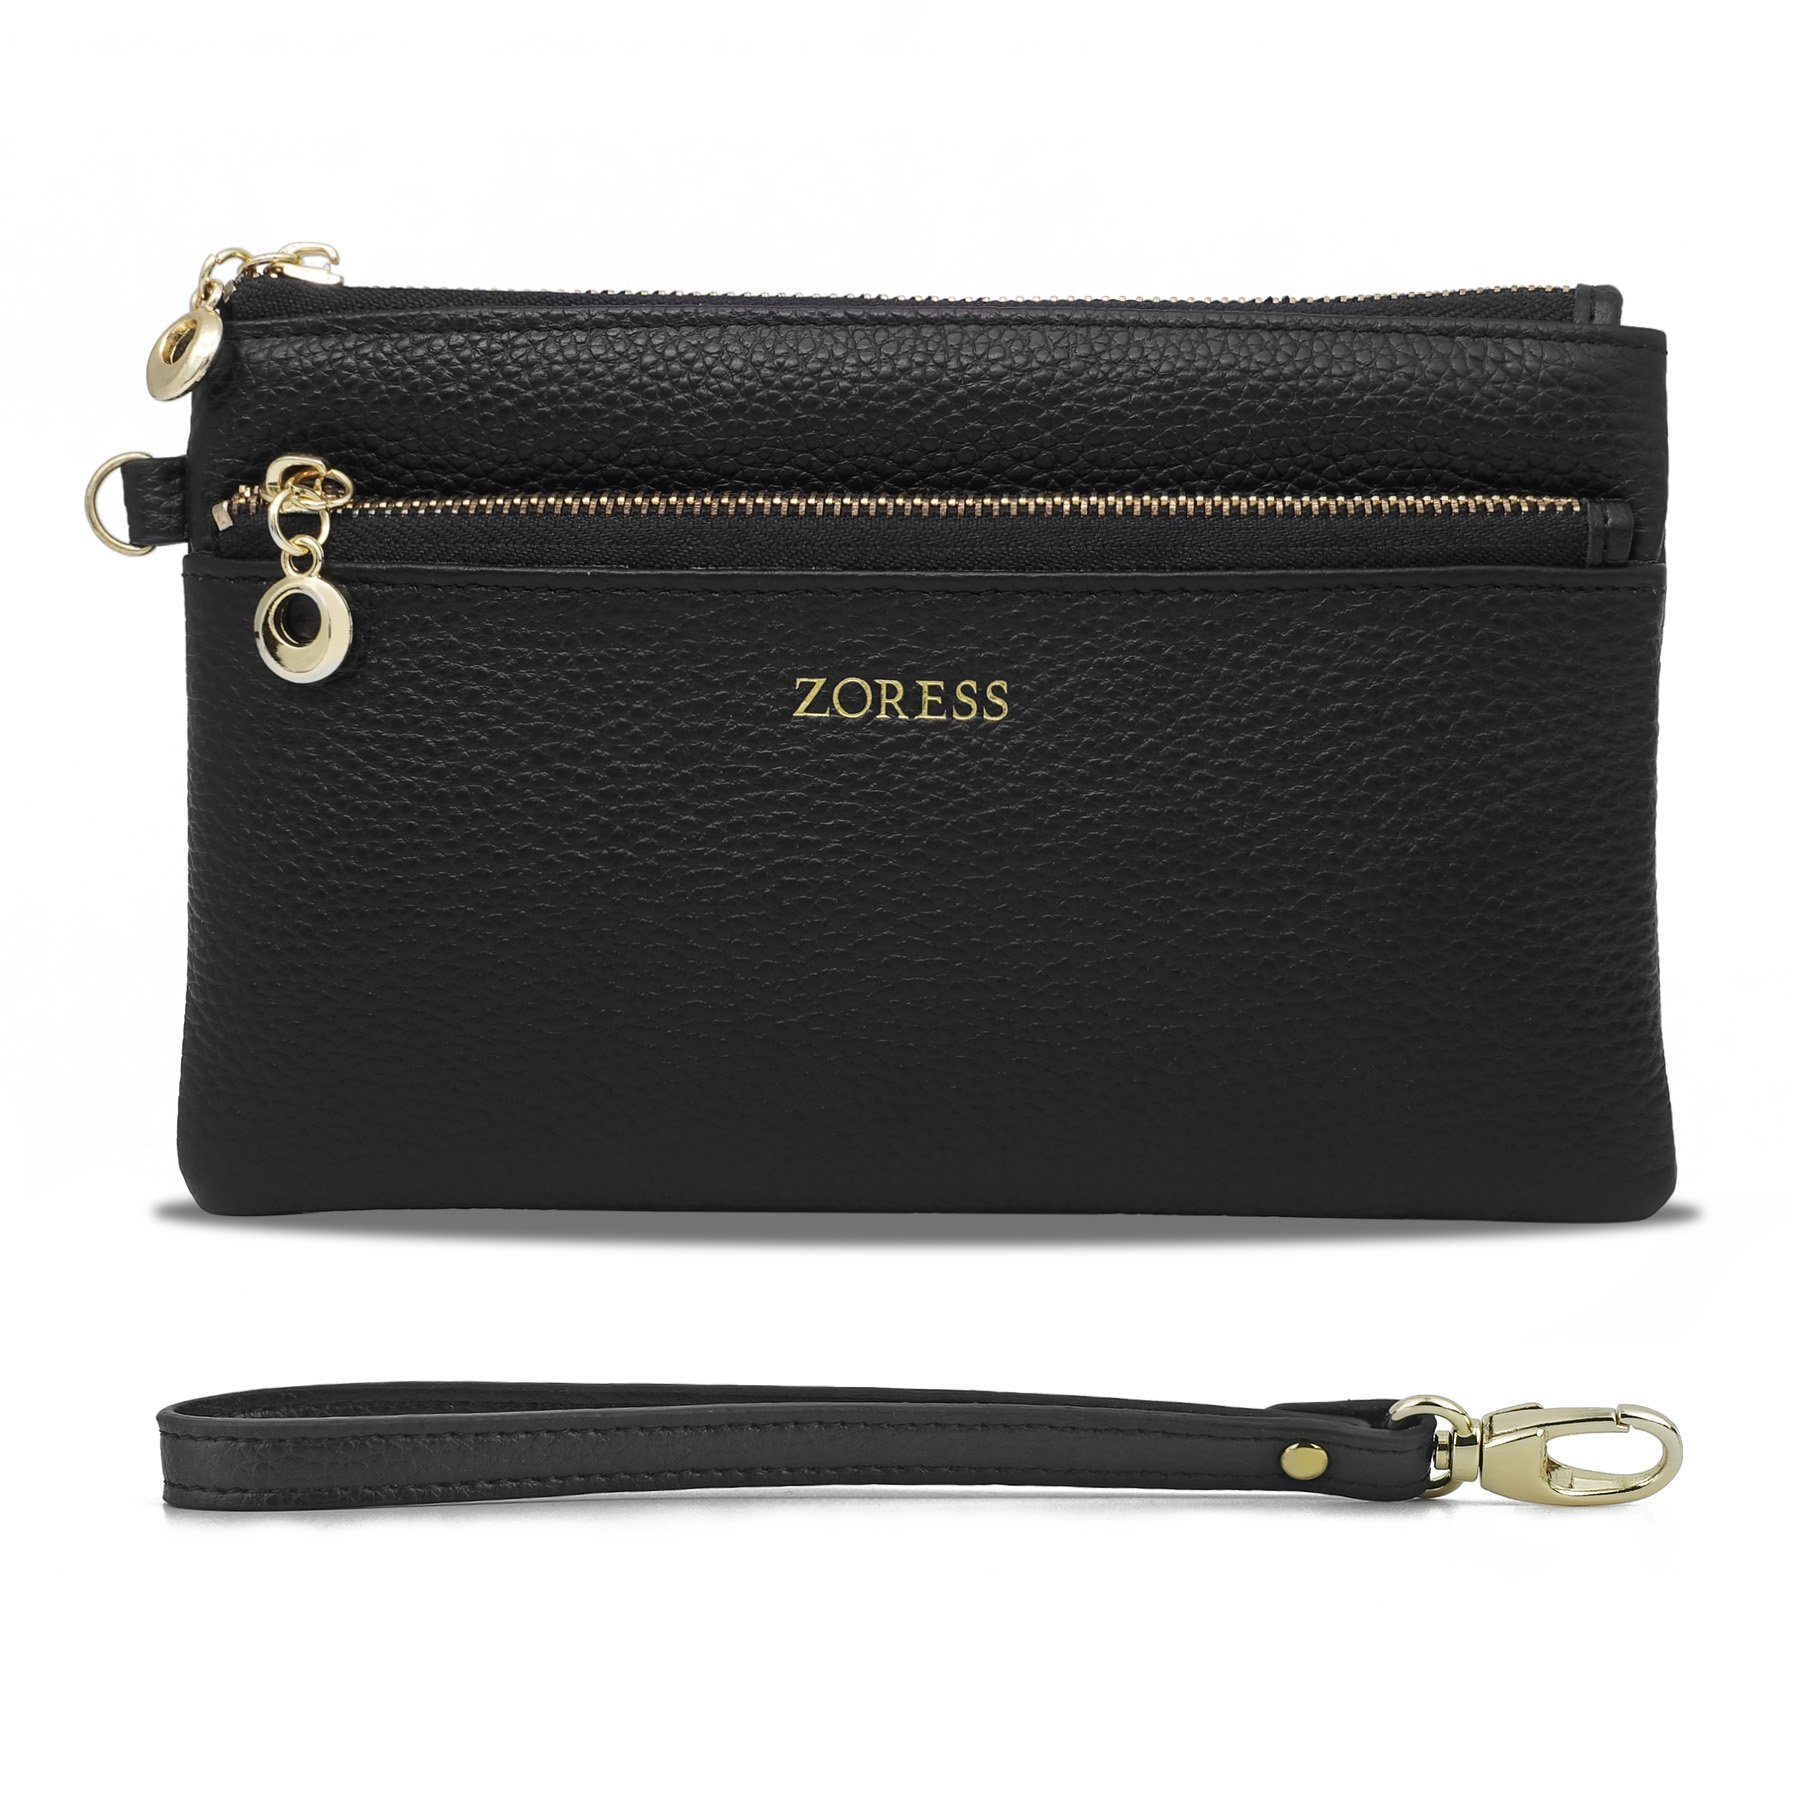 ZORESS Women Genuine Leather Wristlets Bag, Clutch Organizer Wallets Purses for iPhone(Black Long)